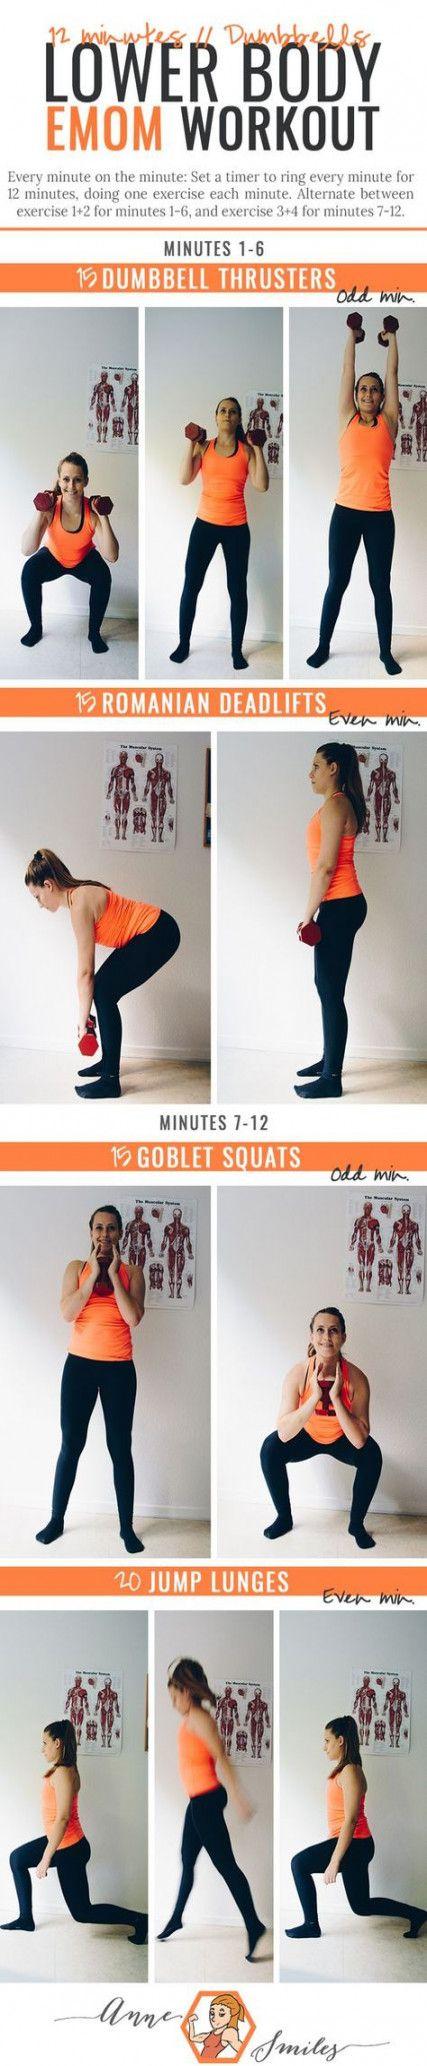 Trendy Fitness Motivacin Body Pictures Kettle Bells Ideas #fitness